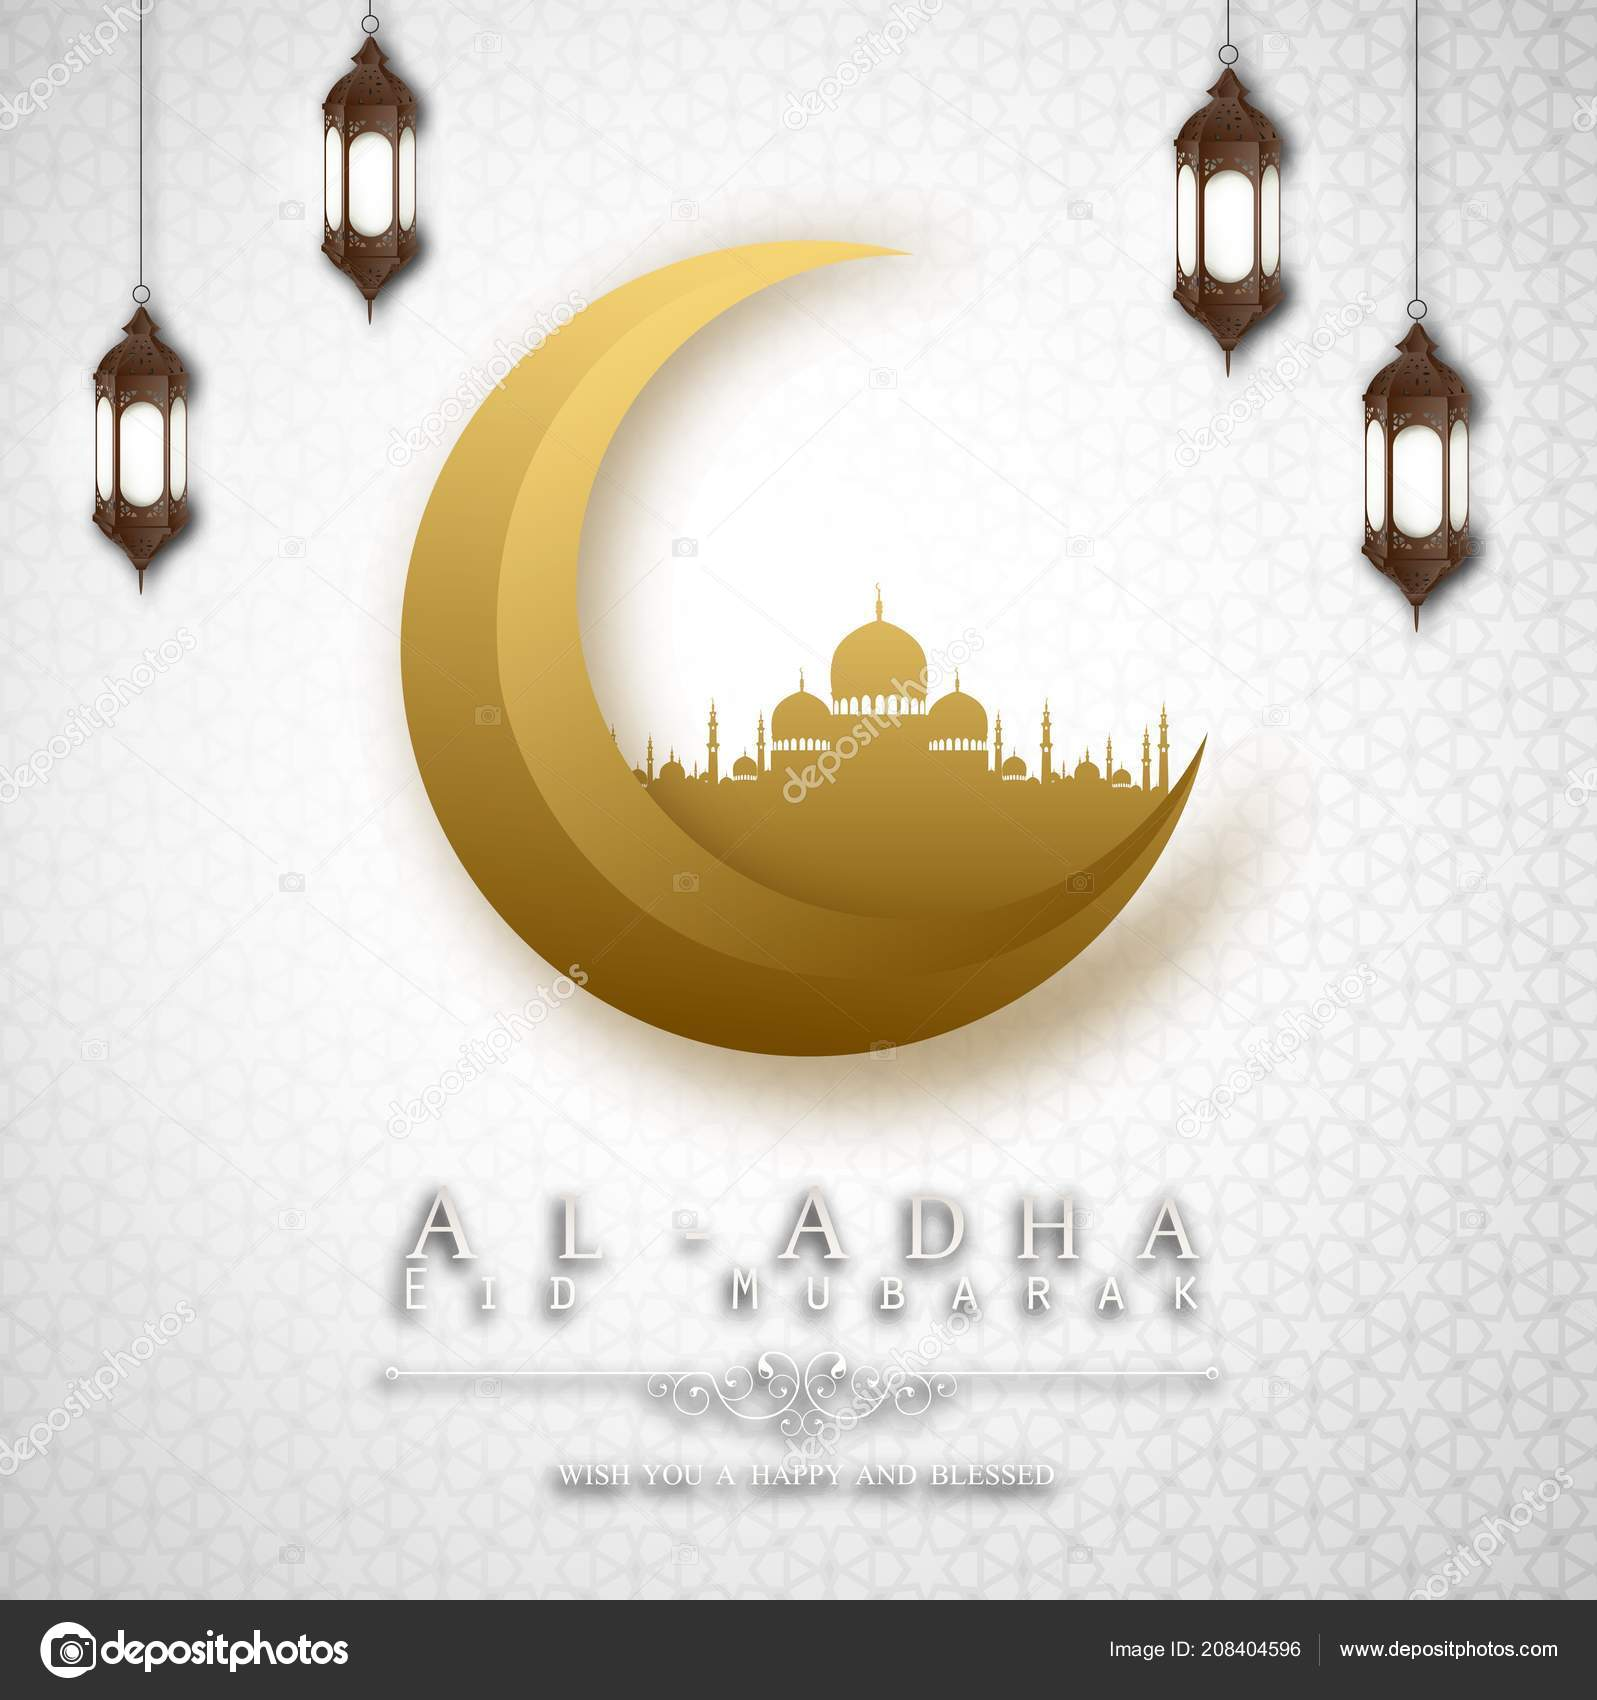 vector illustration happy new hijri year islamic new year greeting stock vector